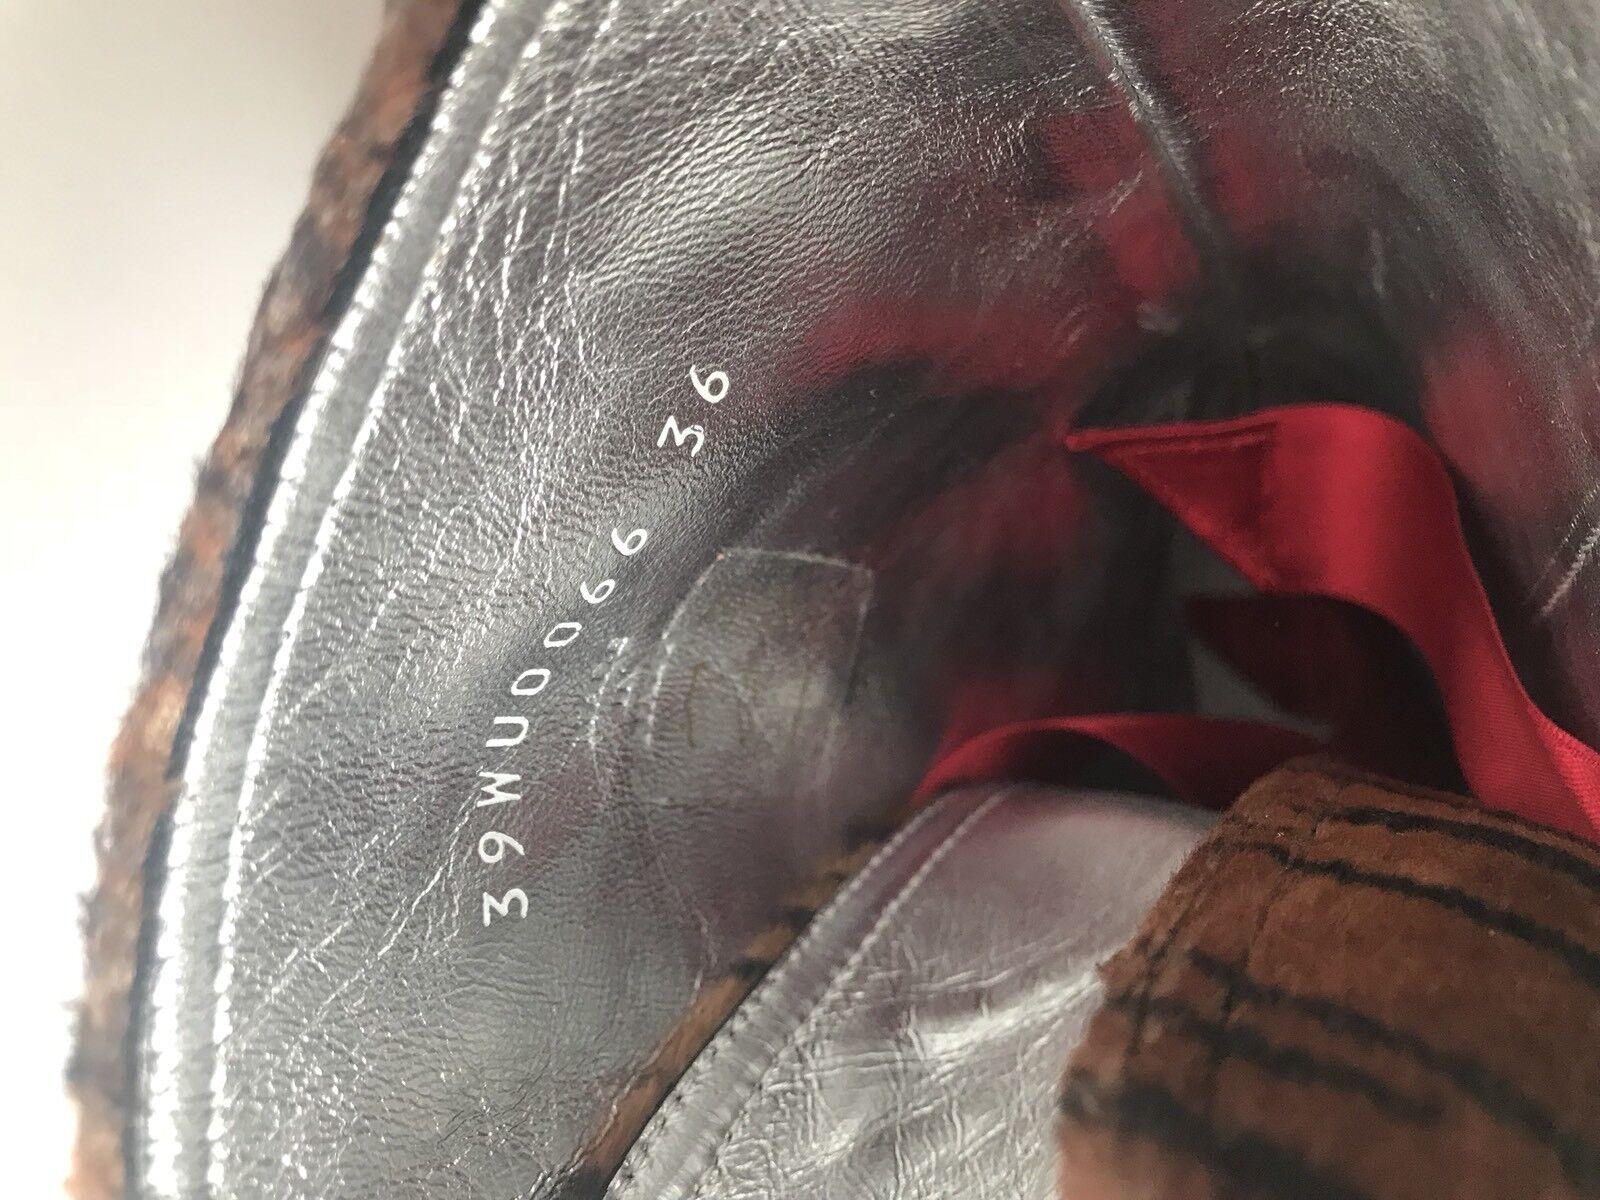 Maison Margiela Margiela Maison FW16 Puntera Alta Top botas Zapatos De Impresión Tigre David Bowie Nuevo en Caja 215bf8